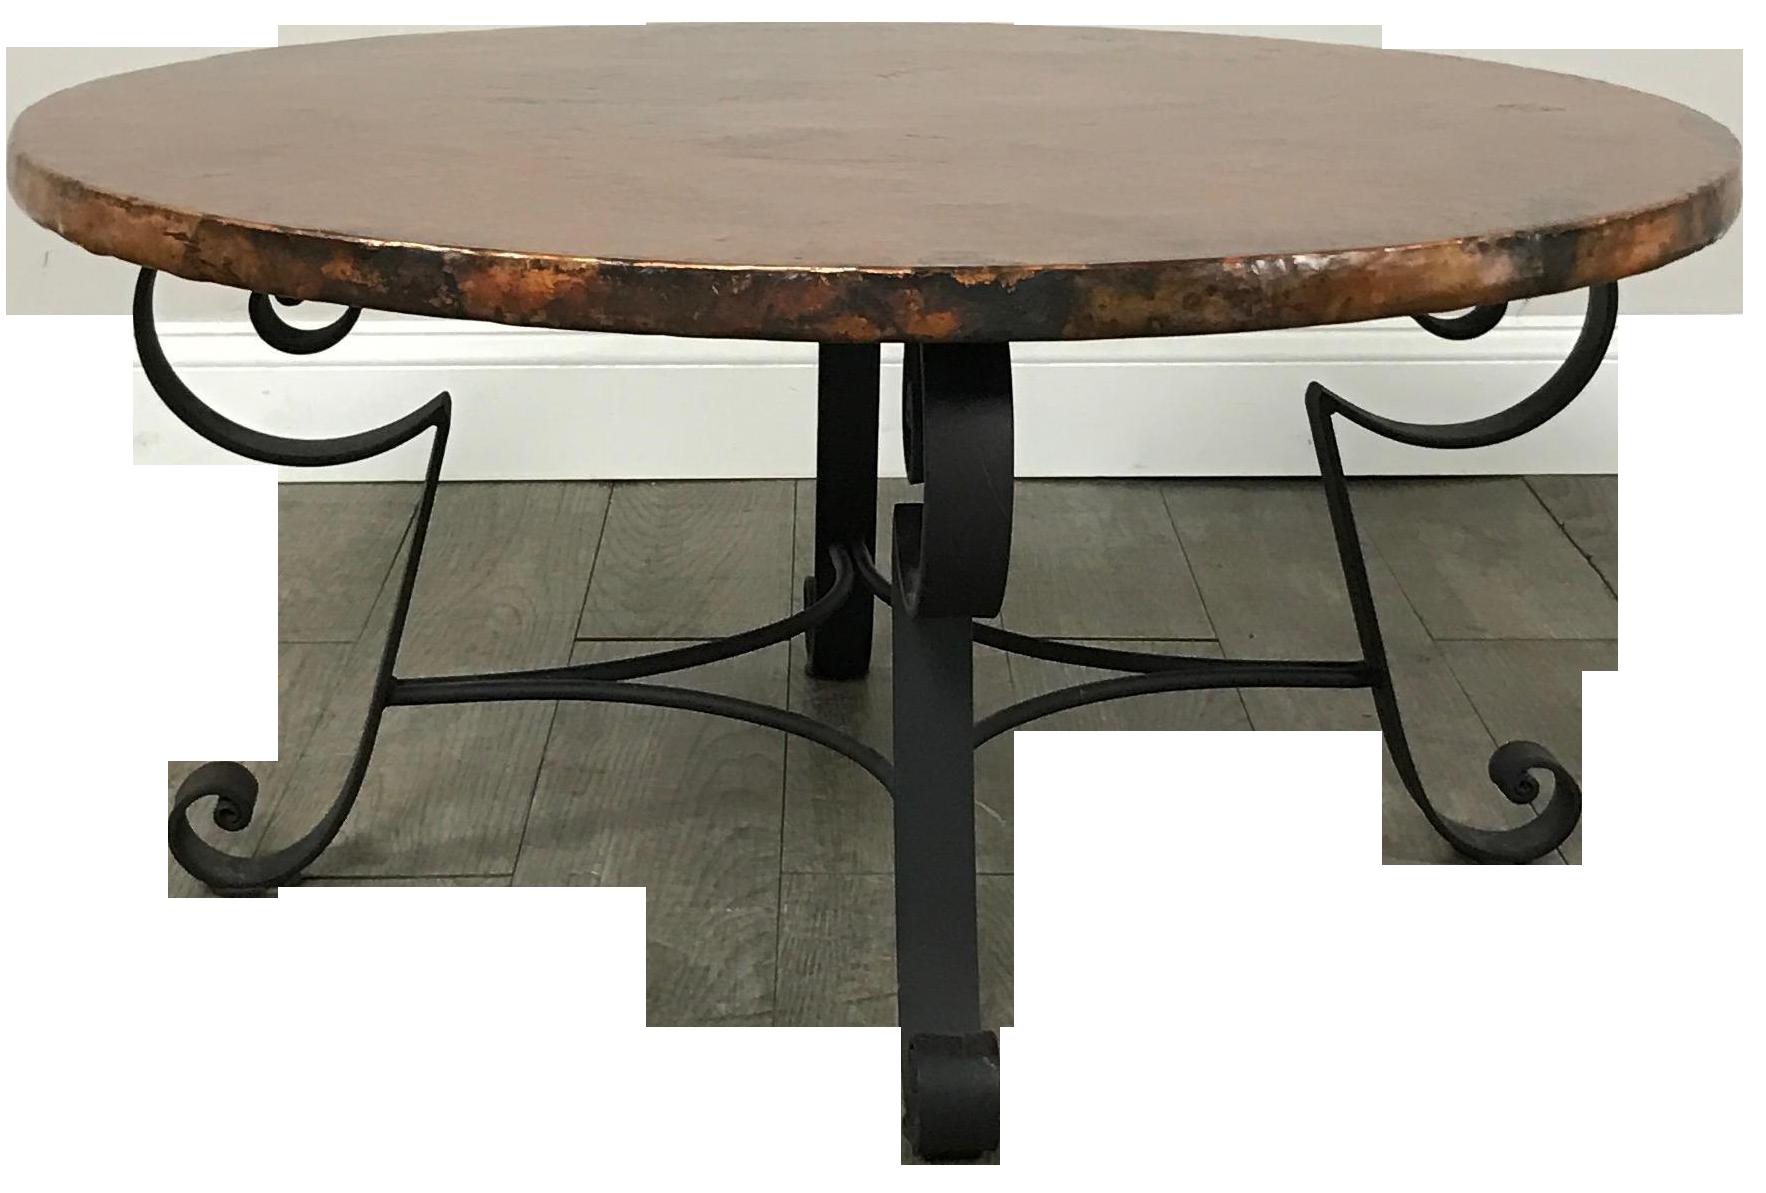 Arhaus Copper Top Coffee Table